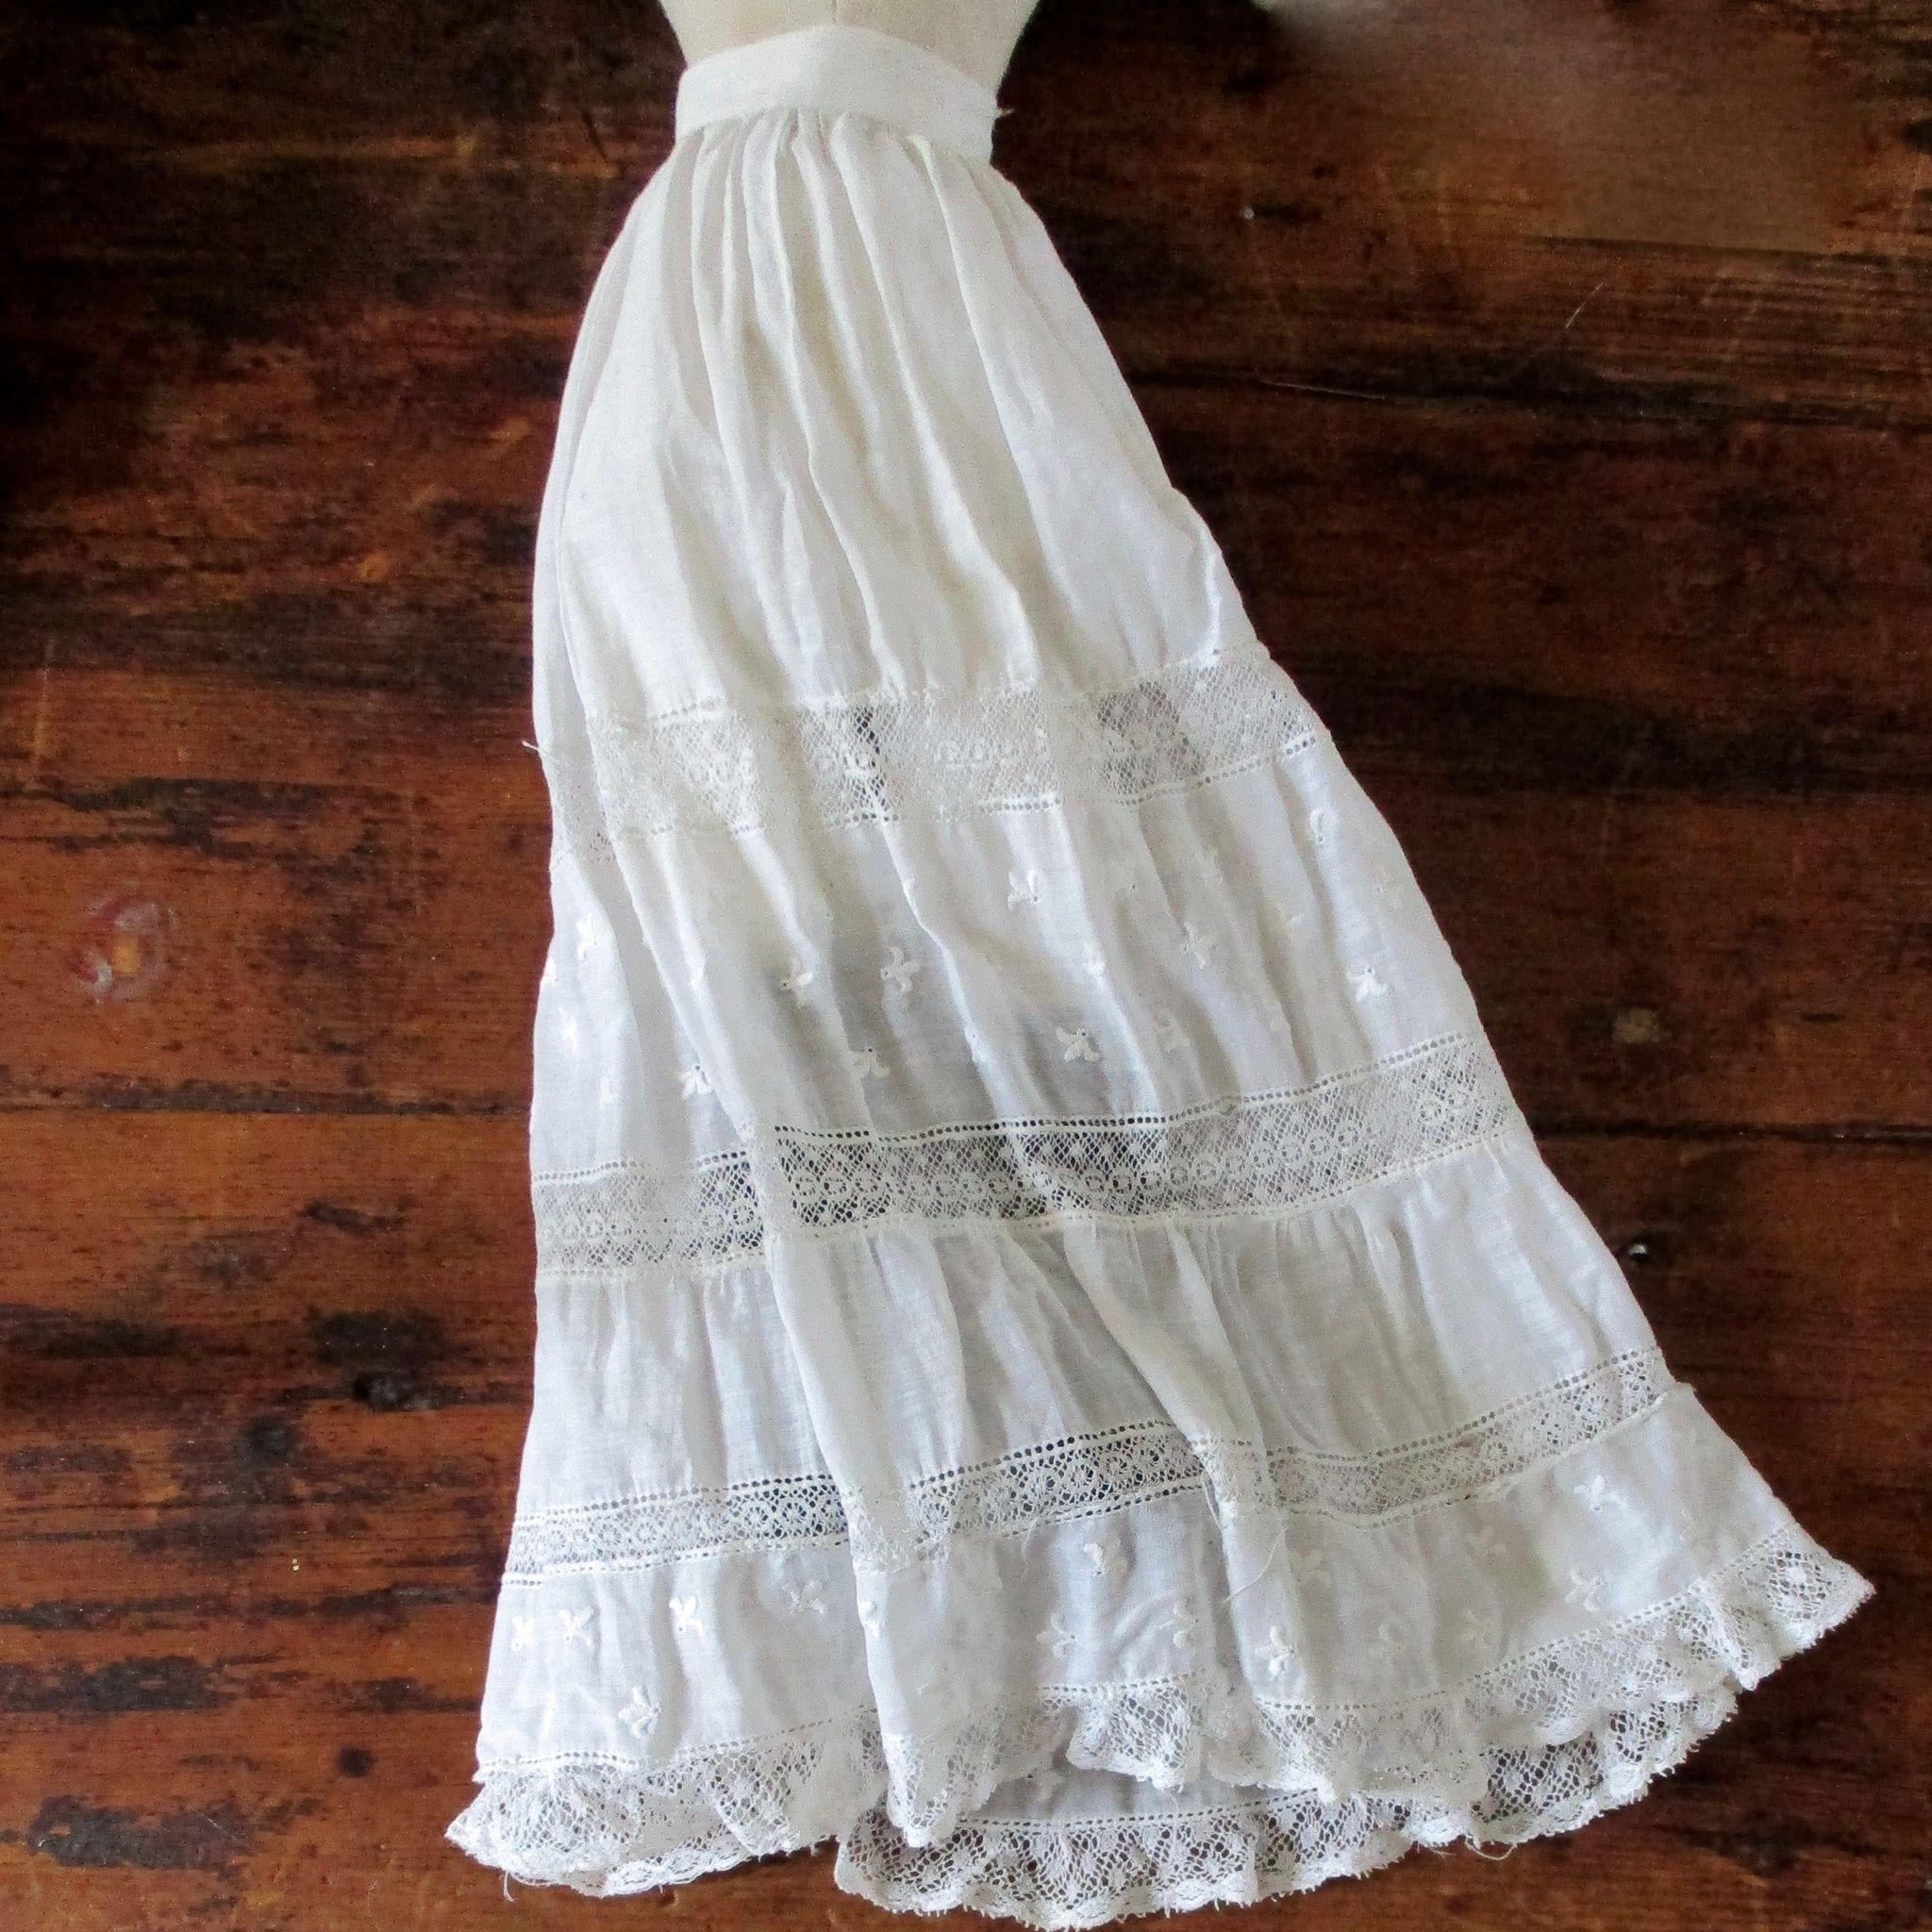 French Fashion Doll Lovely Lace Gown/Petticoat Fleur de Lis